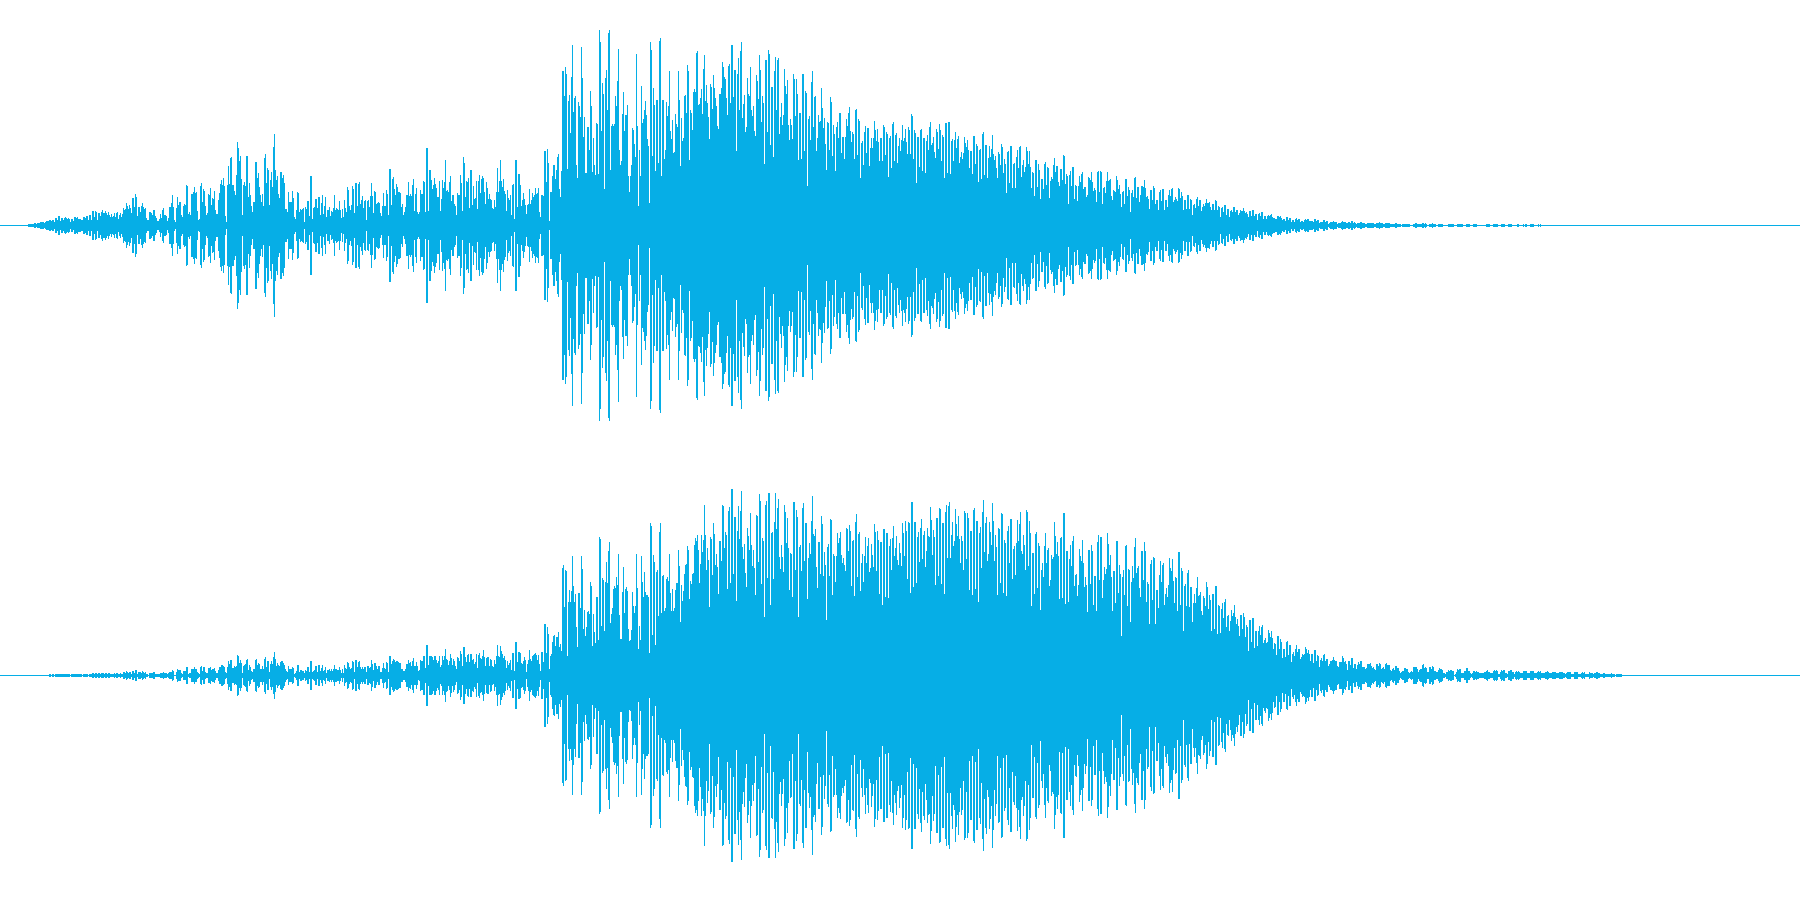 SFや近未来作品に適したほわんとした音の再生済みの波形